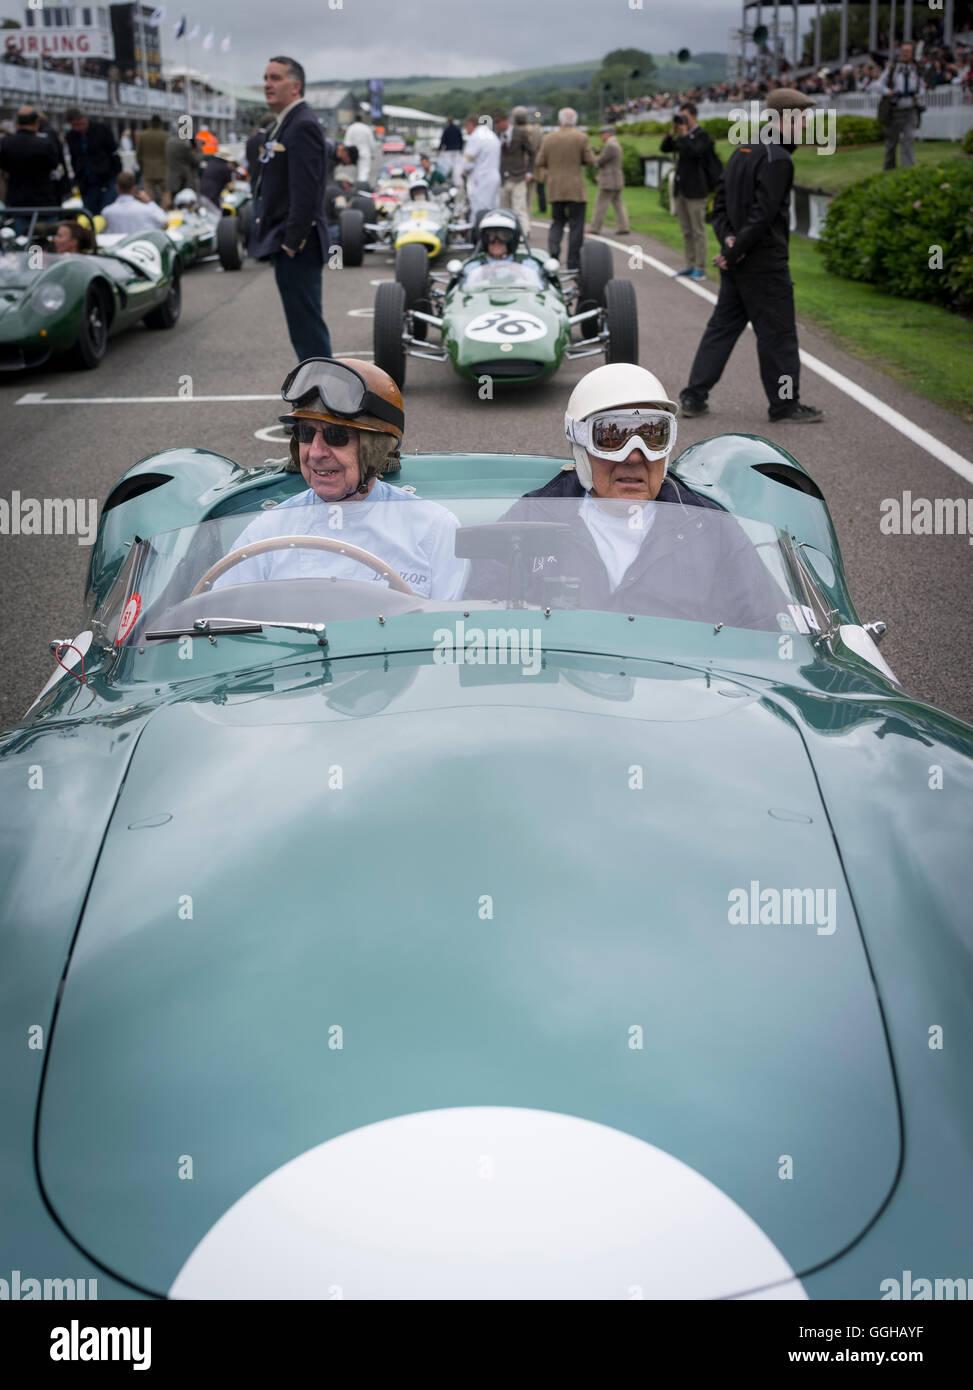 1959 Aston Martin DBR1 Fahrer Tony Brooks (L) und Sir Stirling Moss (R), Jim Clark Parade, Goodwood Revival, racing, Stockbild